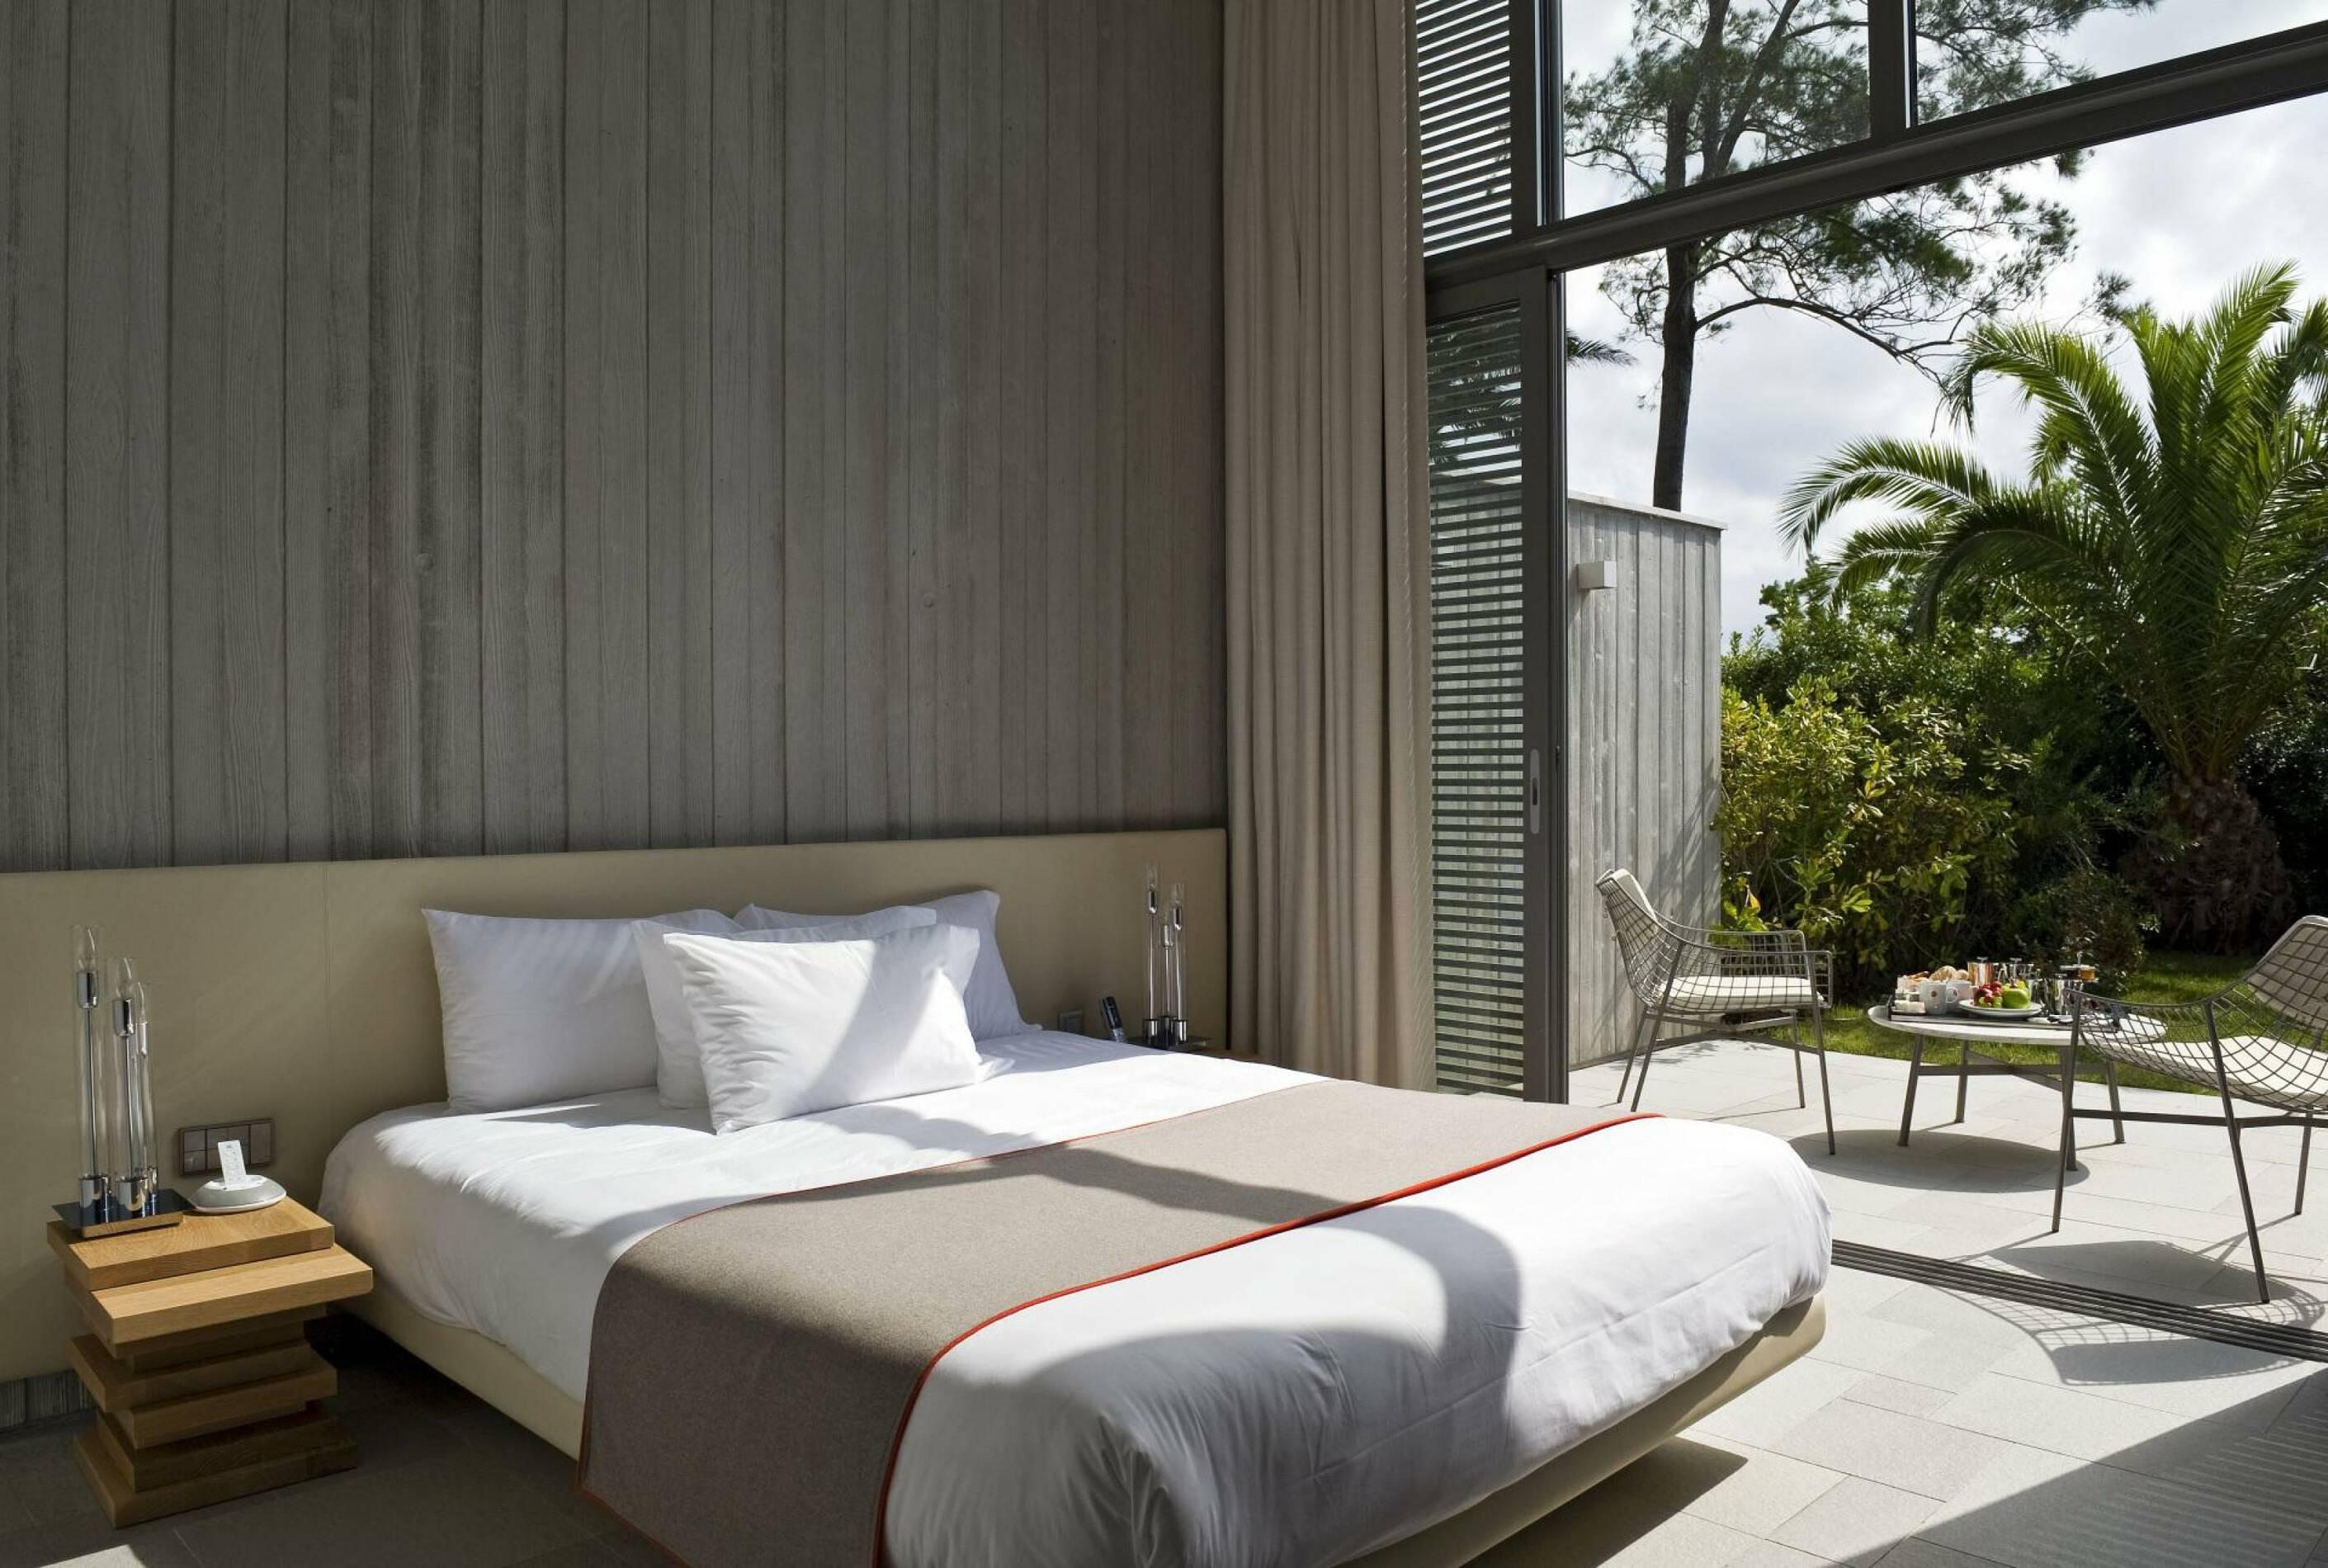 Hotel Sezz Bungalow Chambre Saint Tropez